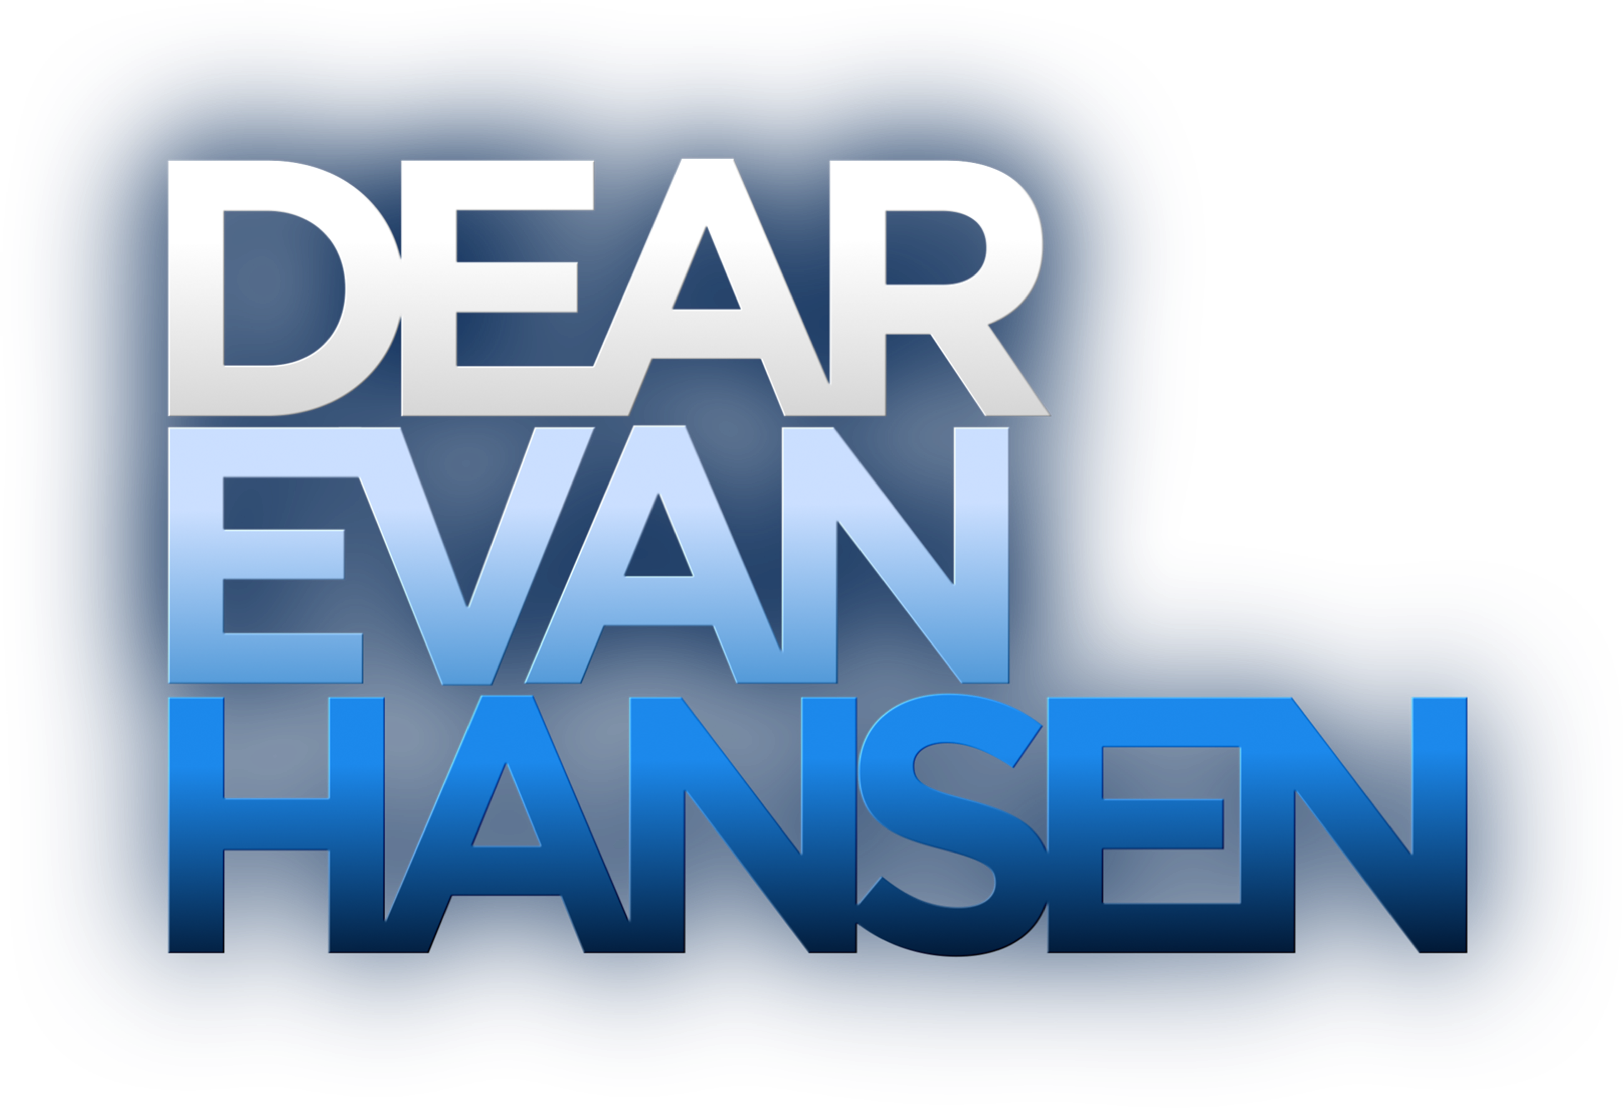 Dear Evan Hansen. Movie in theaters September 24, 2021.